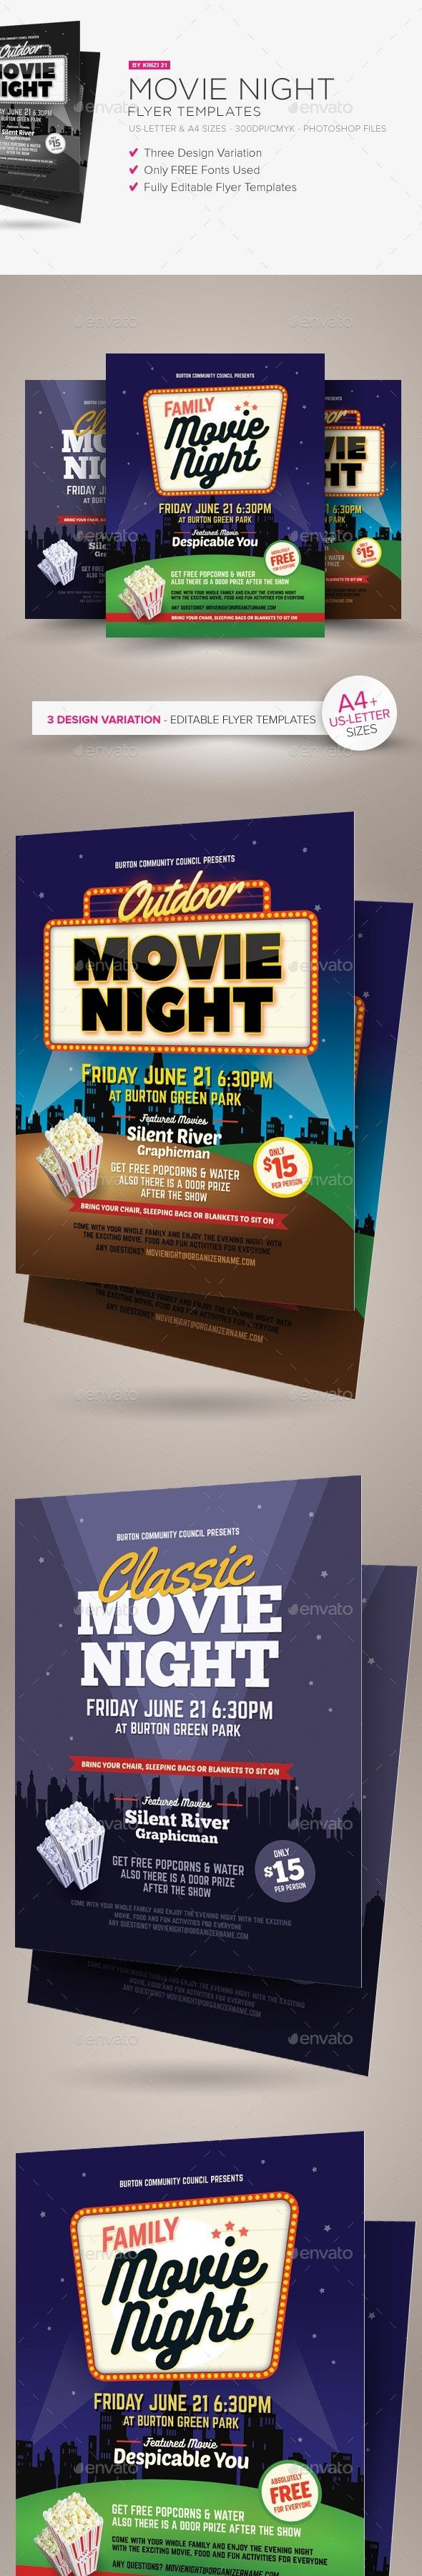 Ad Ads Advert Popcorn Classic Community Event Family